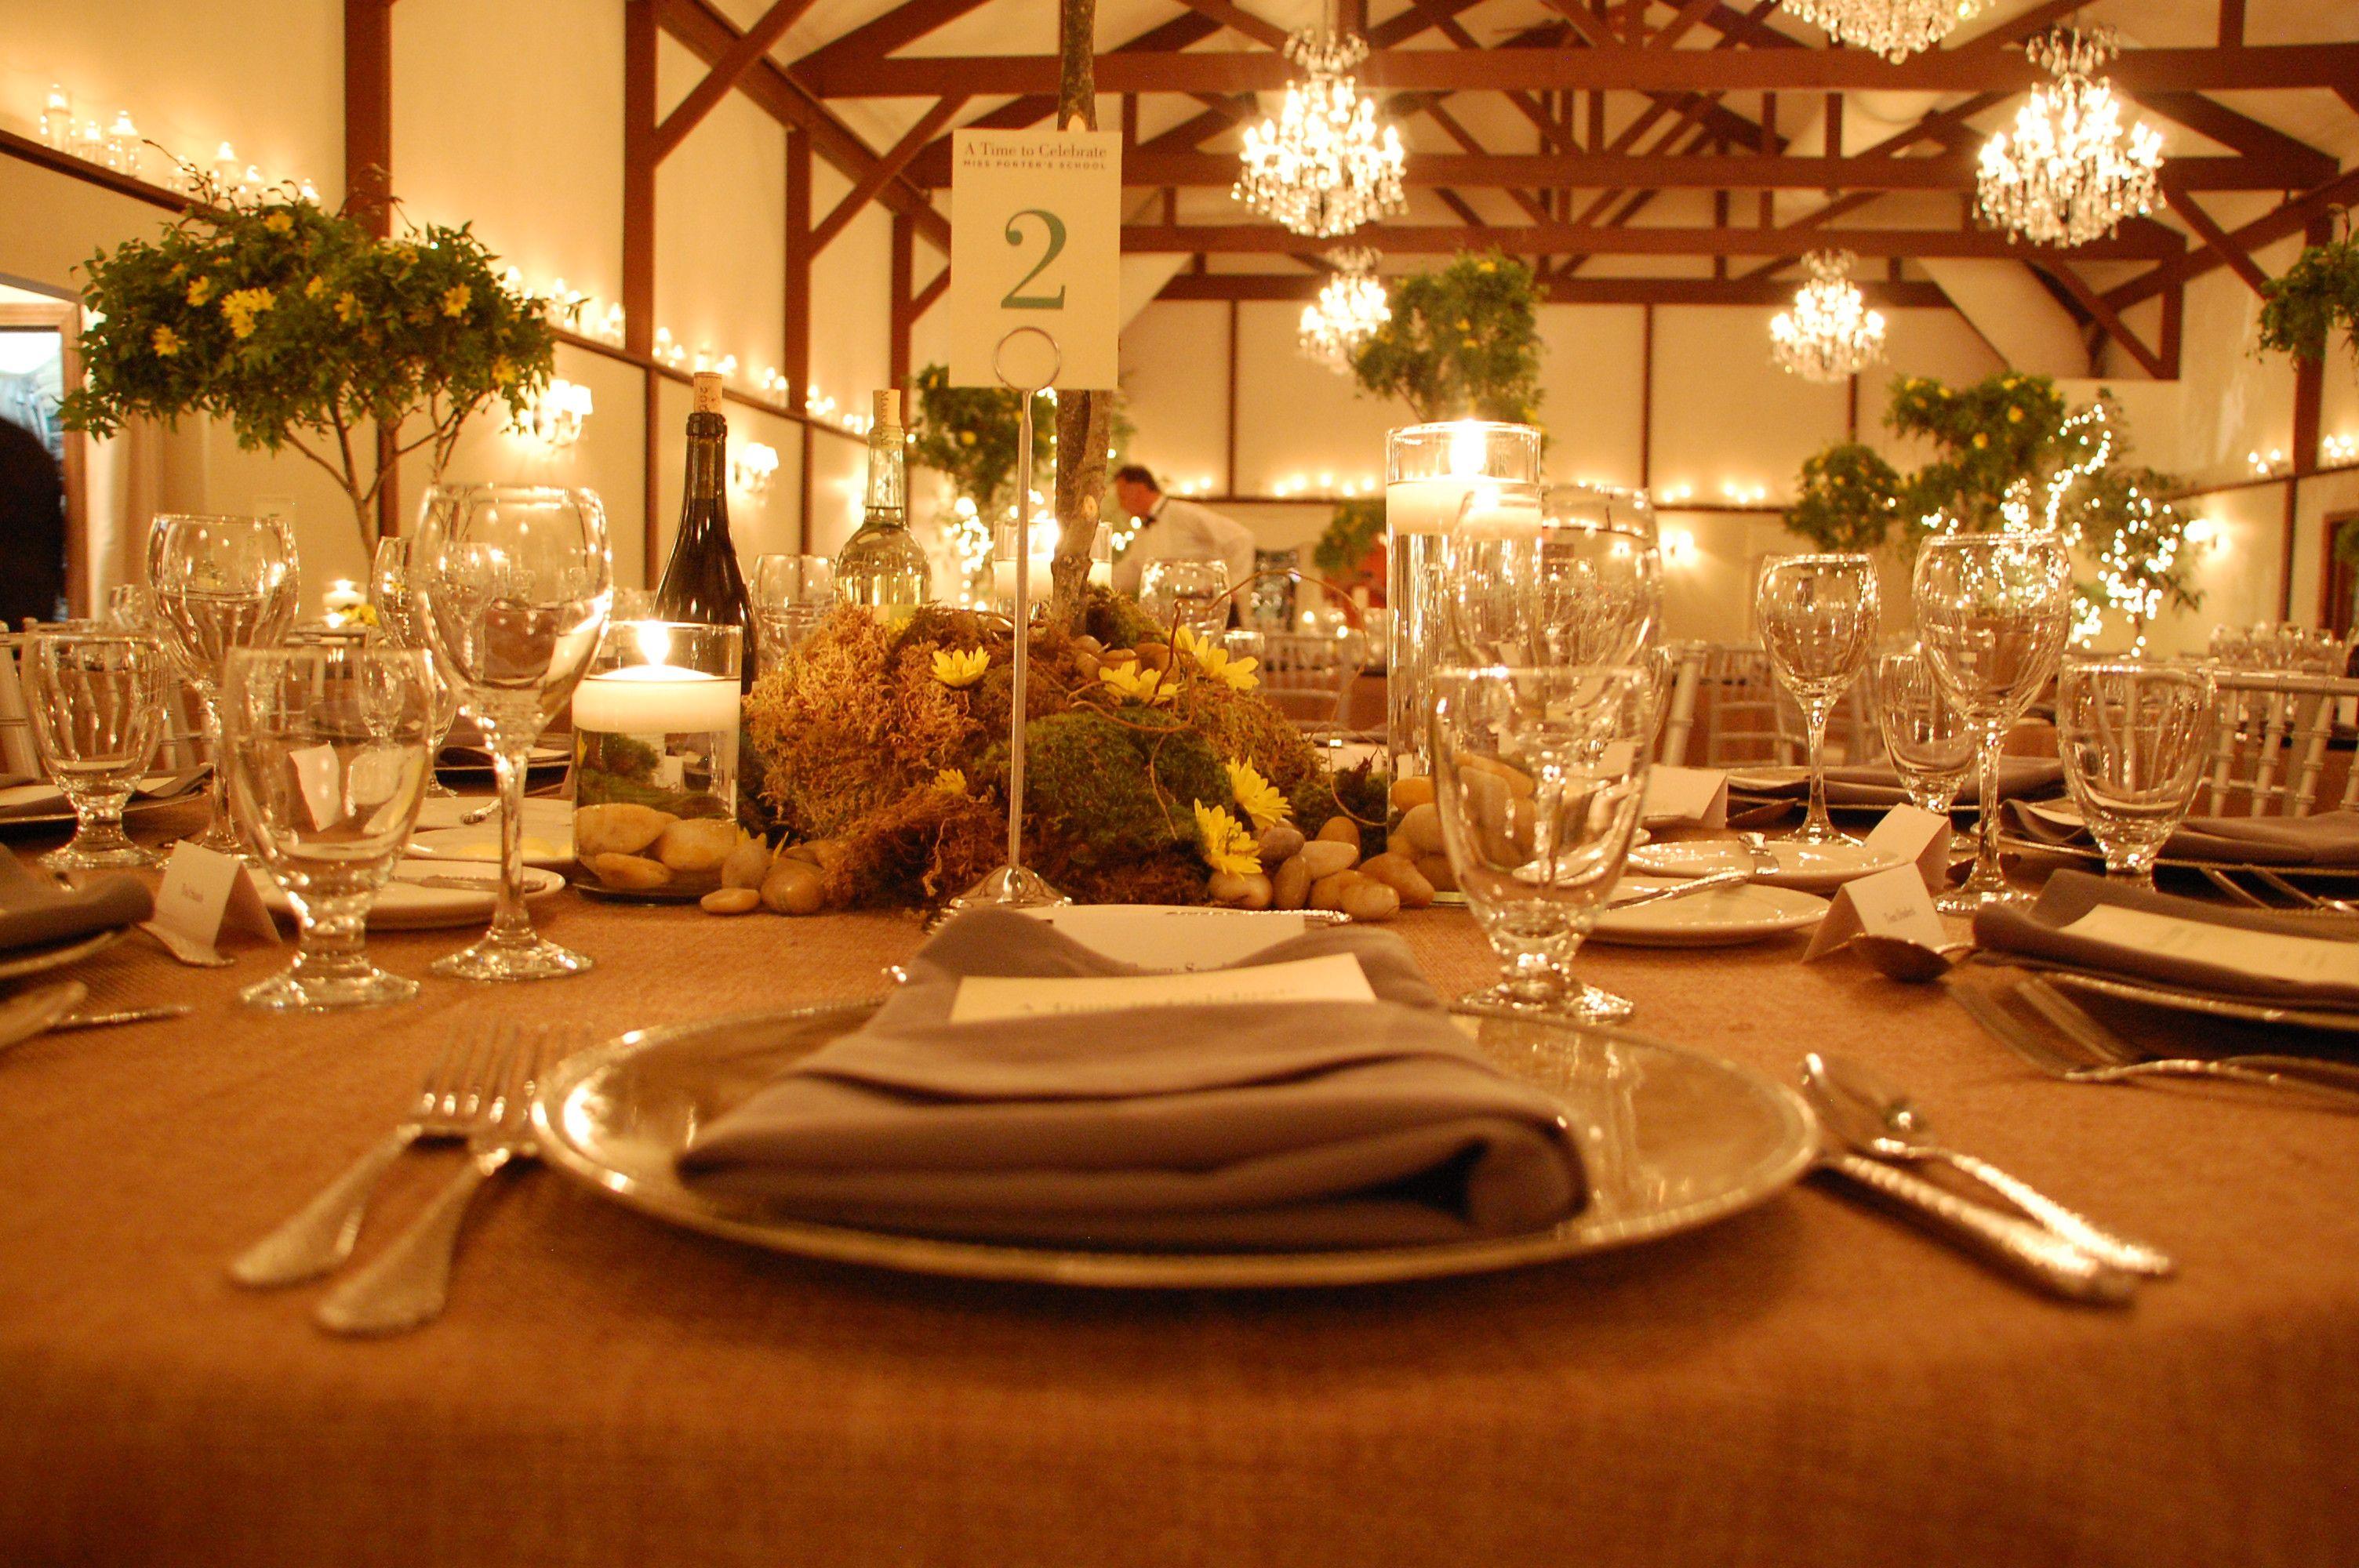 Stylish place setting | Table Settings | Pinterest ...